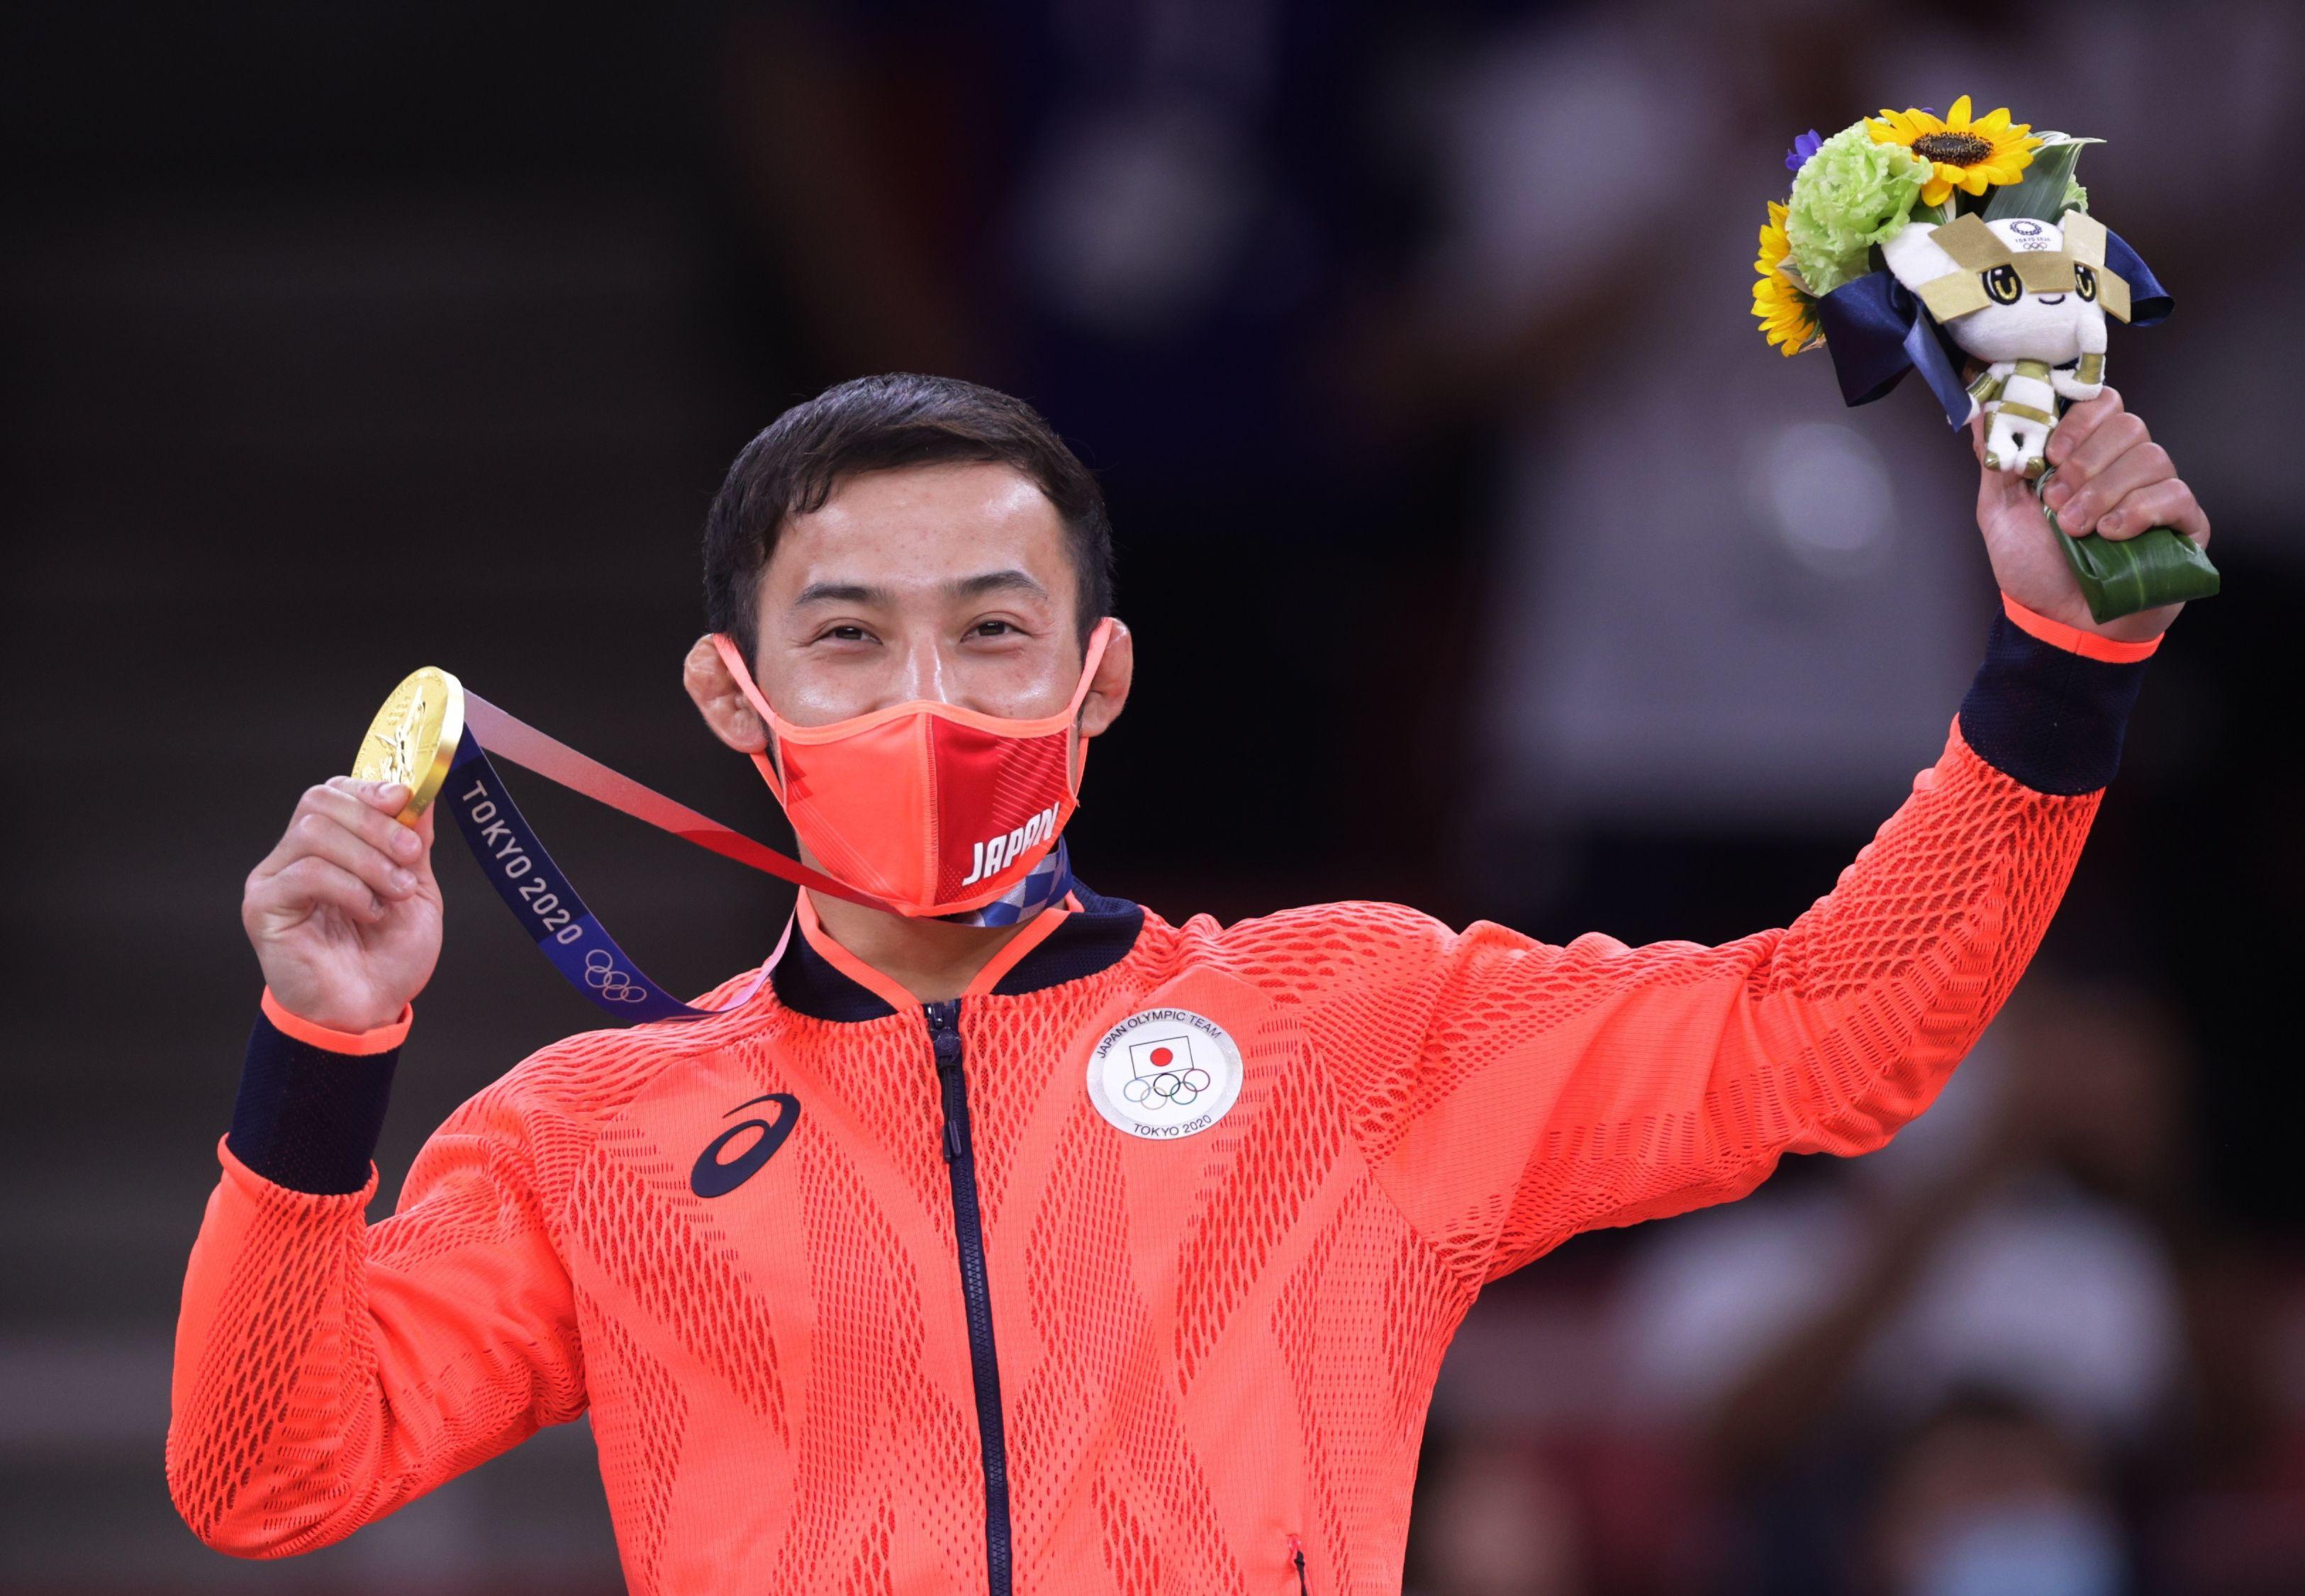 Tokyo 2020 Olympics - Judo - Men's 60kg - Medal Ceremony - Nippon Budokan - Tokyo, Japan - July 24, 2021. Gold medallist Naohisa Takato of Japan celebrates REUTERS/Hannah Mckay